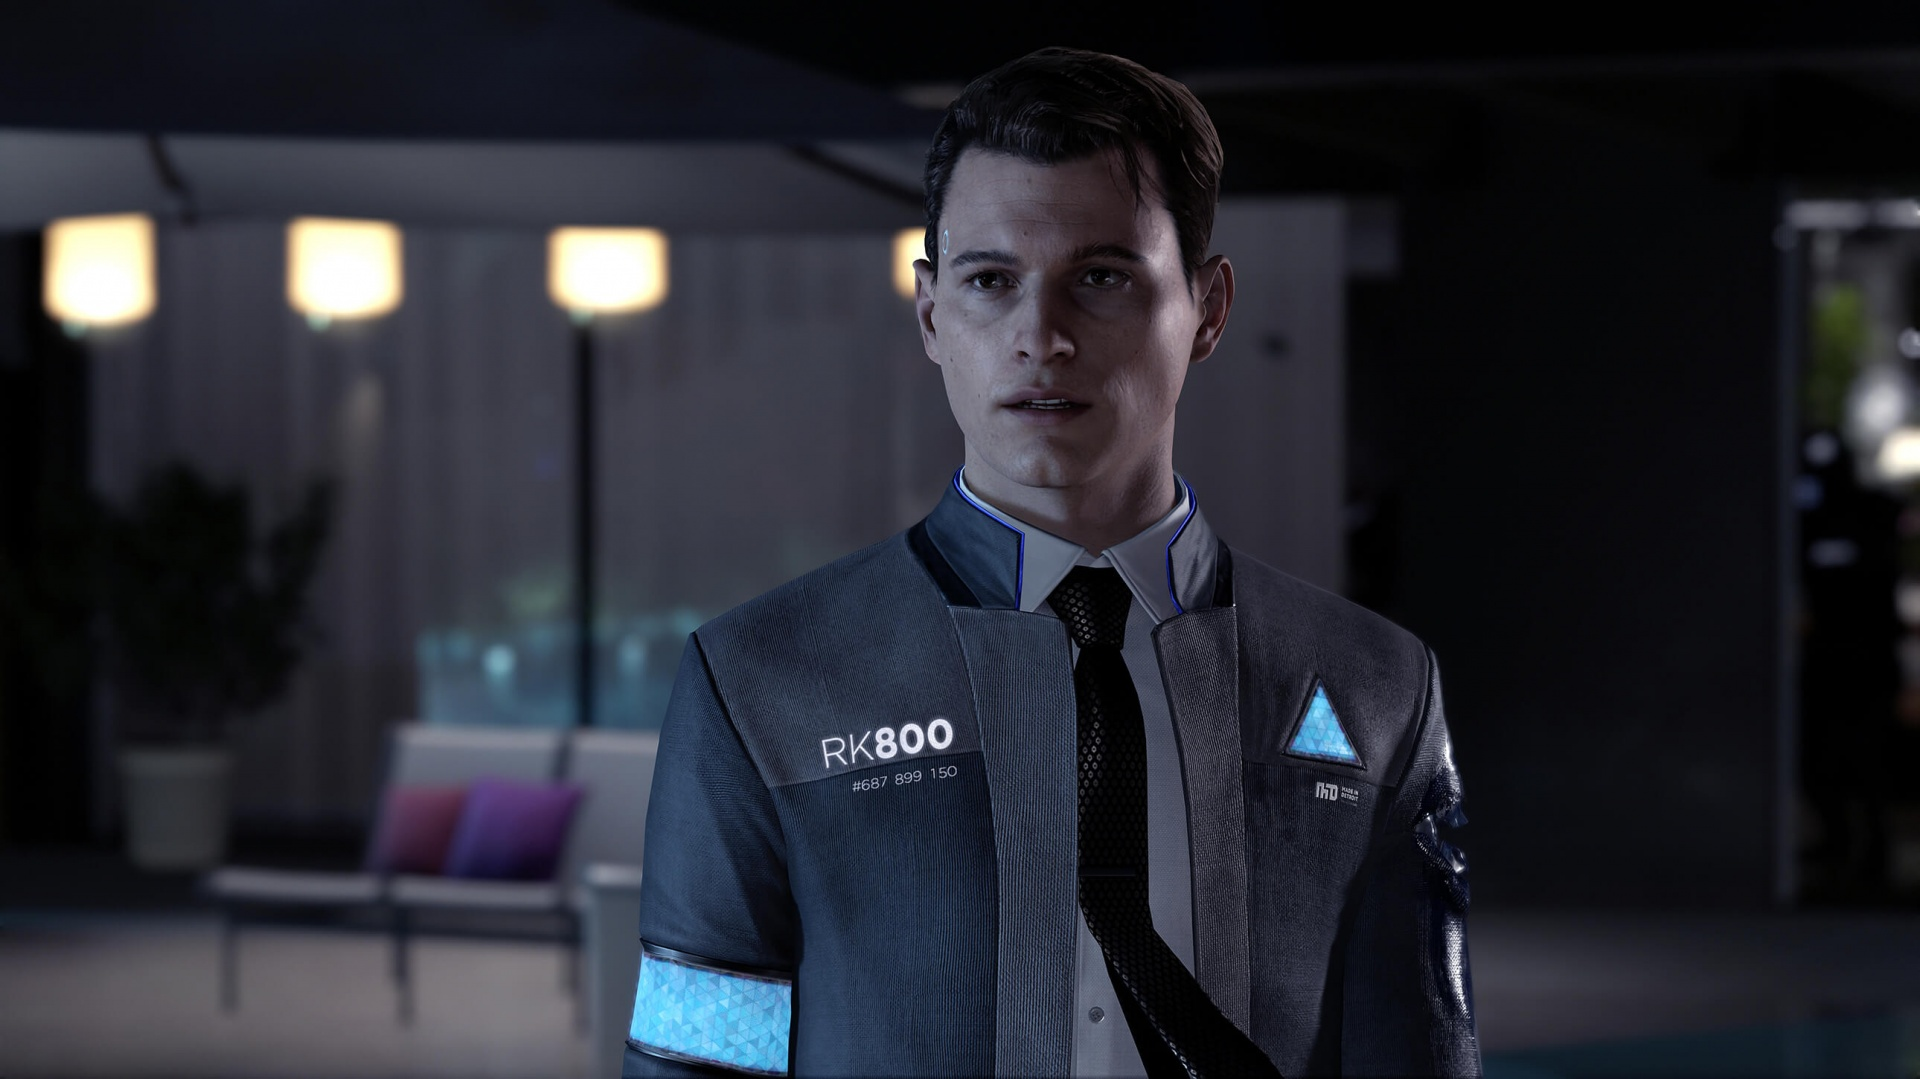 Демоверсия Detroit: Become Human для PC скоро вернётся в EGS